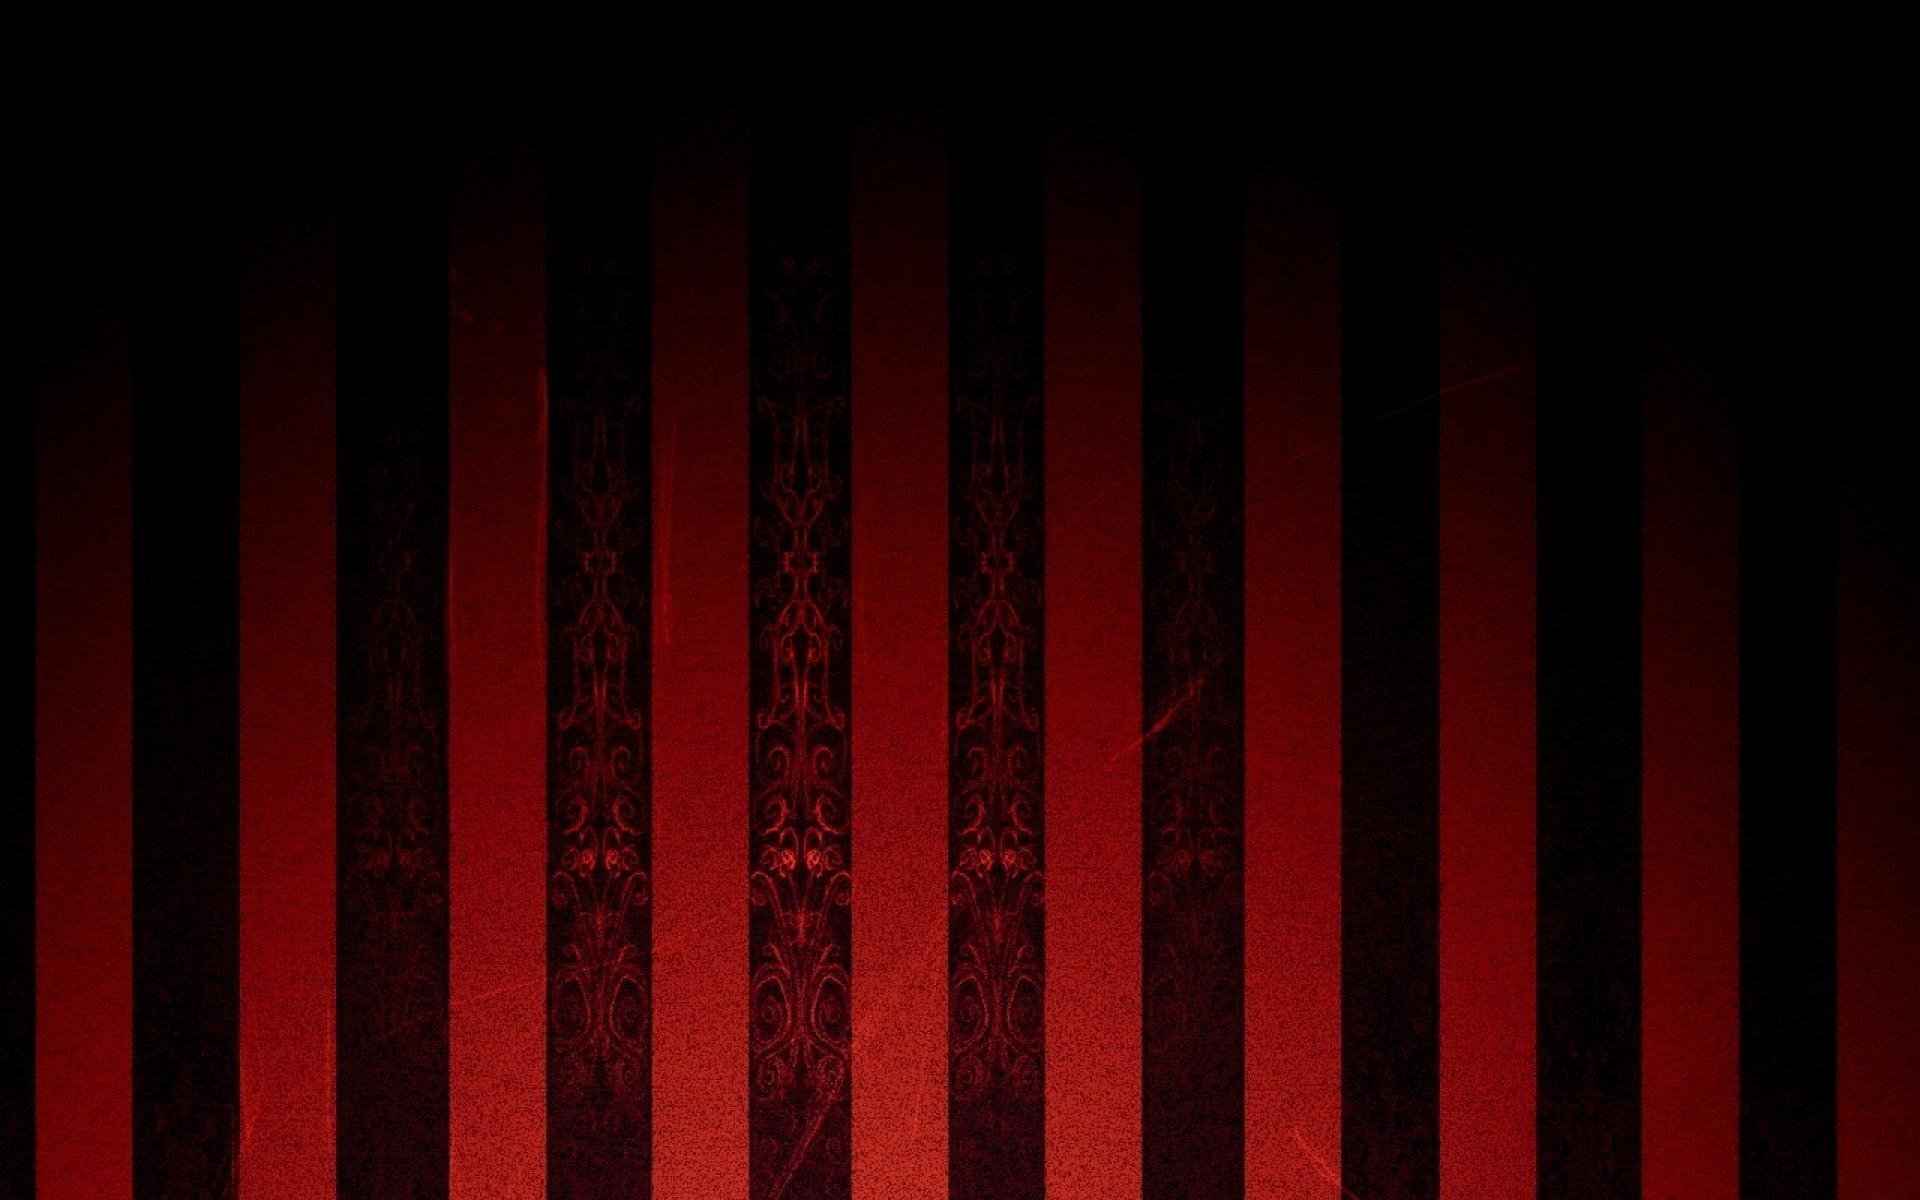 Black Red Background Wallpaper (69+ images)